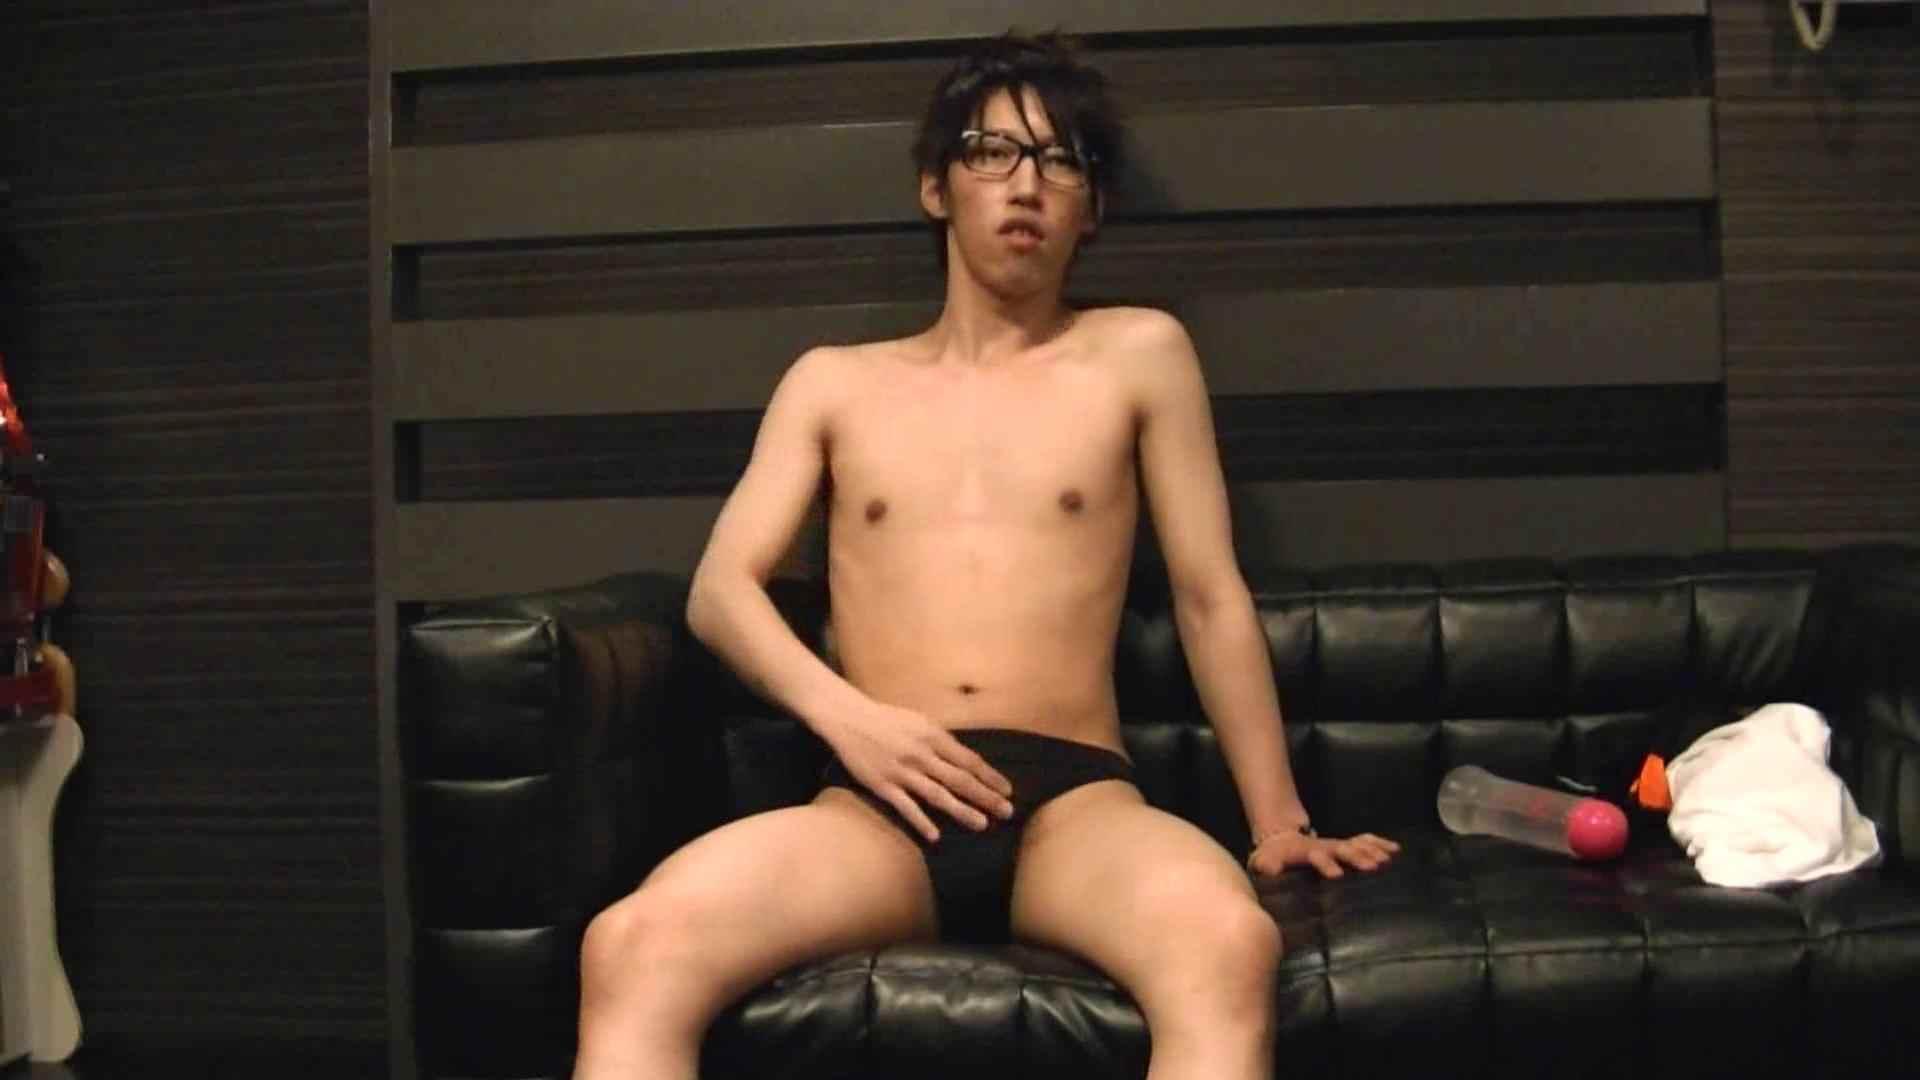 ONA見せカーニバル!! Vol3 男  93pic 2